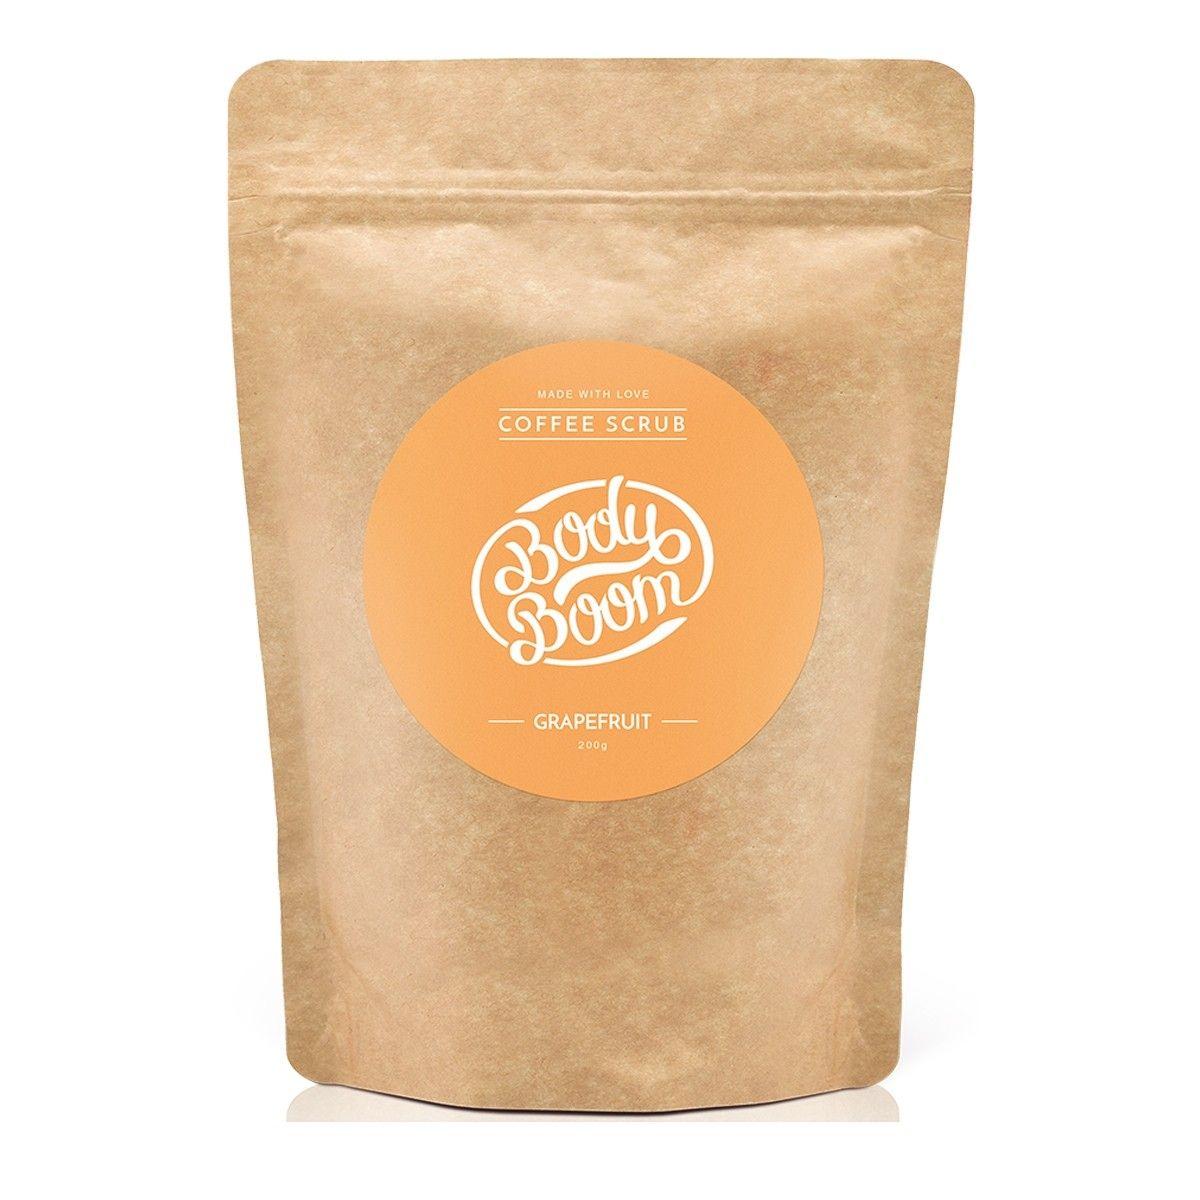 Afbeelding van Bodyboom Coffee Scrub Grapefruit Bodyscrub Beauty